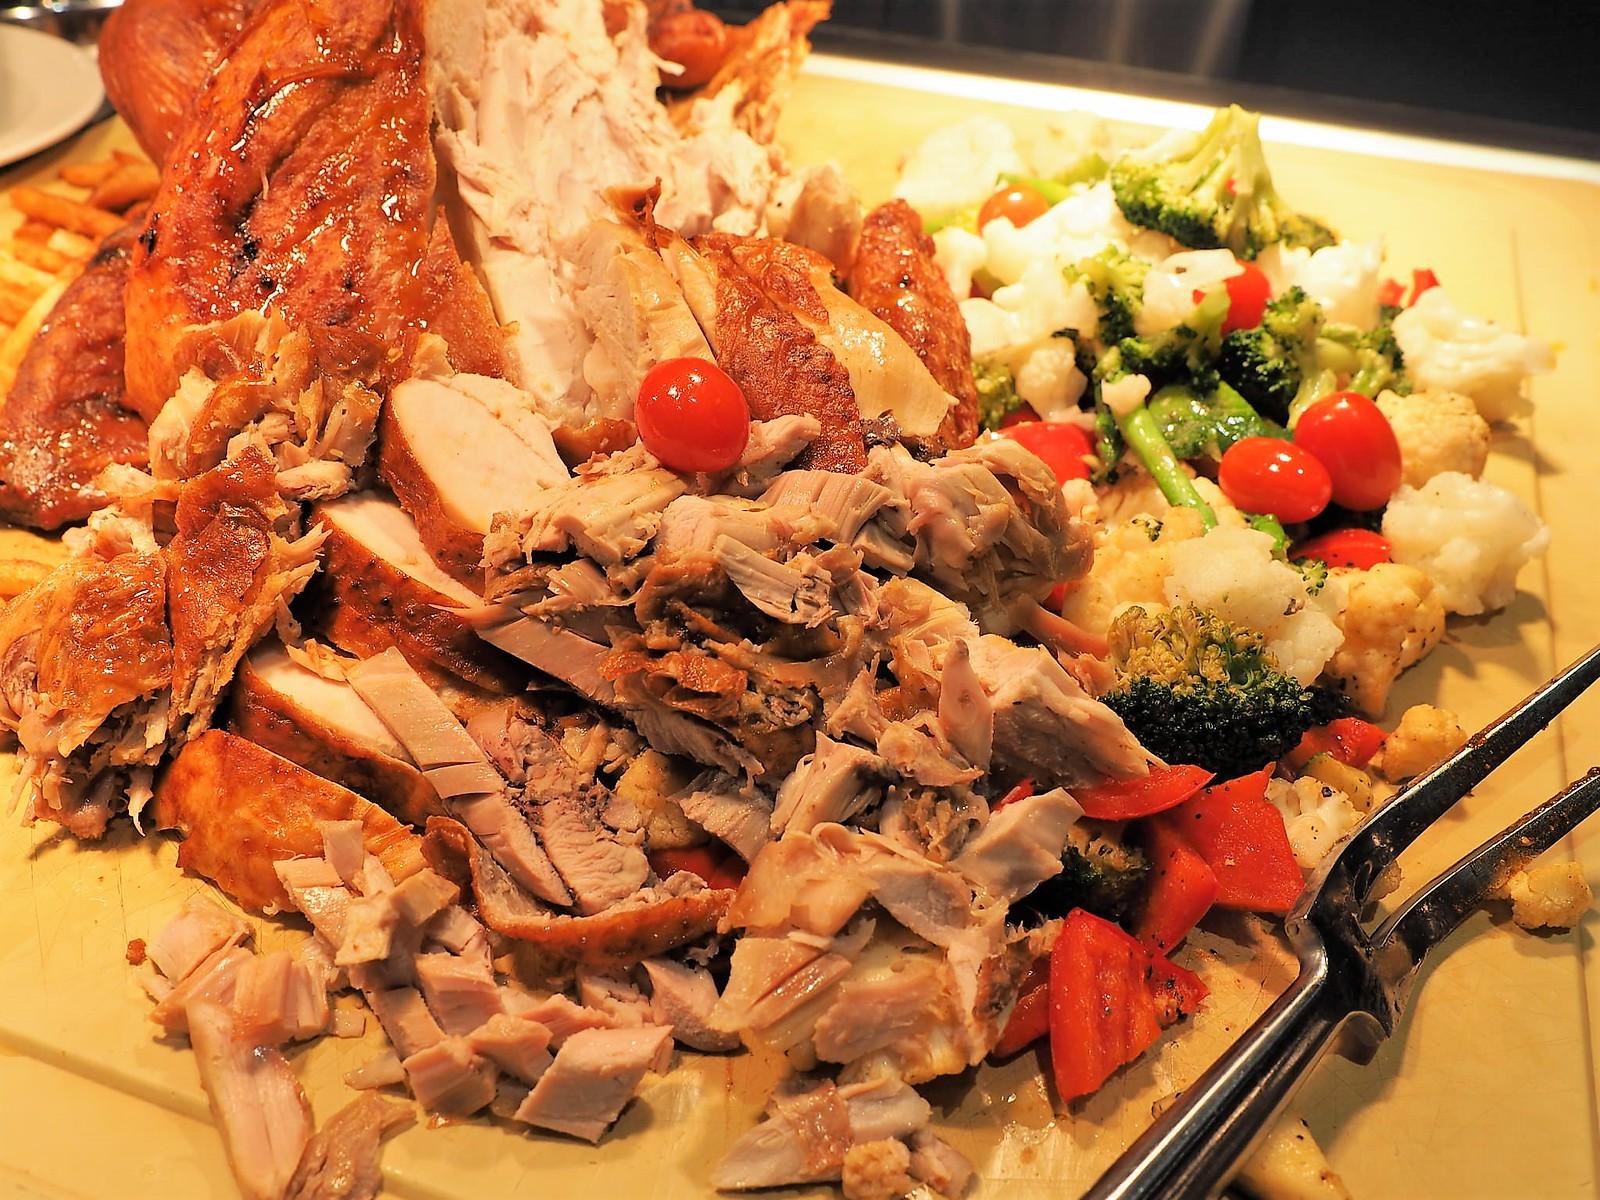 Roasted turkey for Christmas Buffet at Feast @ Sheraton Petaling Jaya.